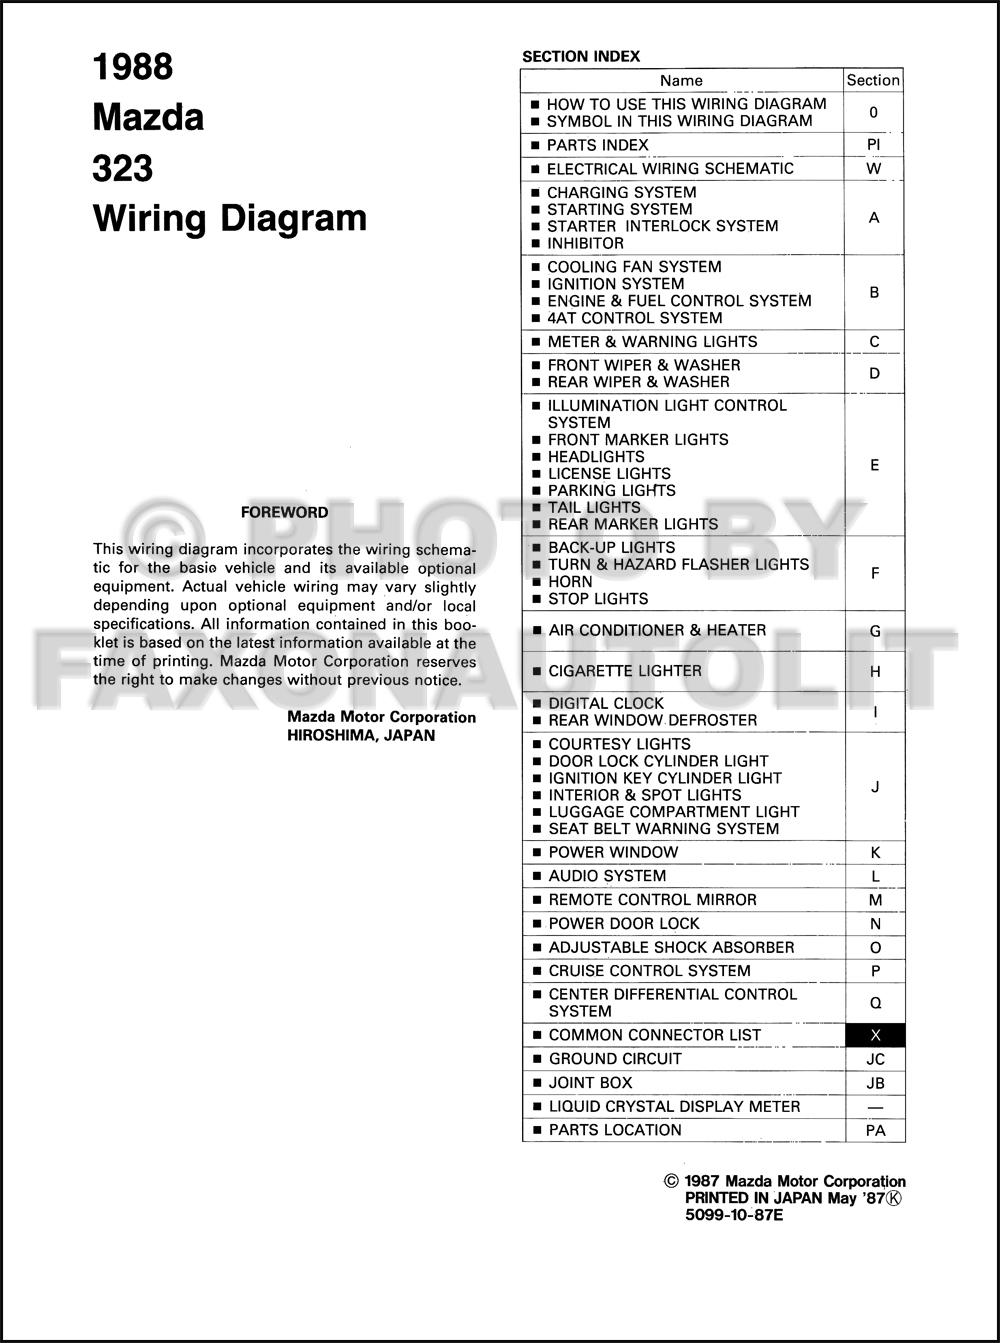 wiring diagram mazda 323